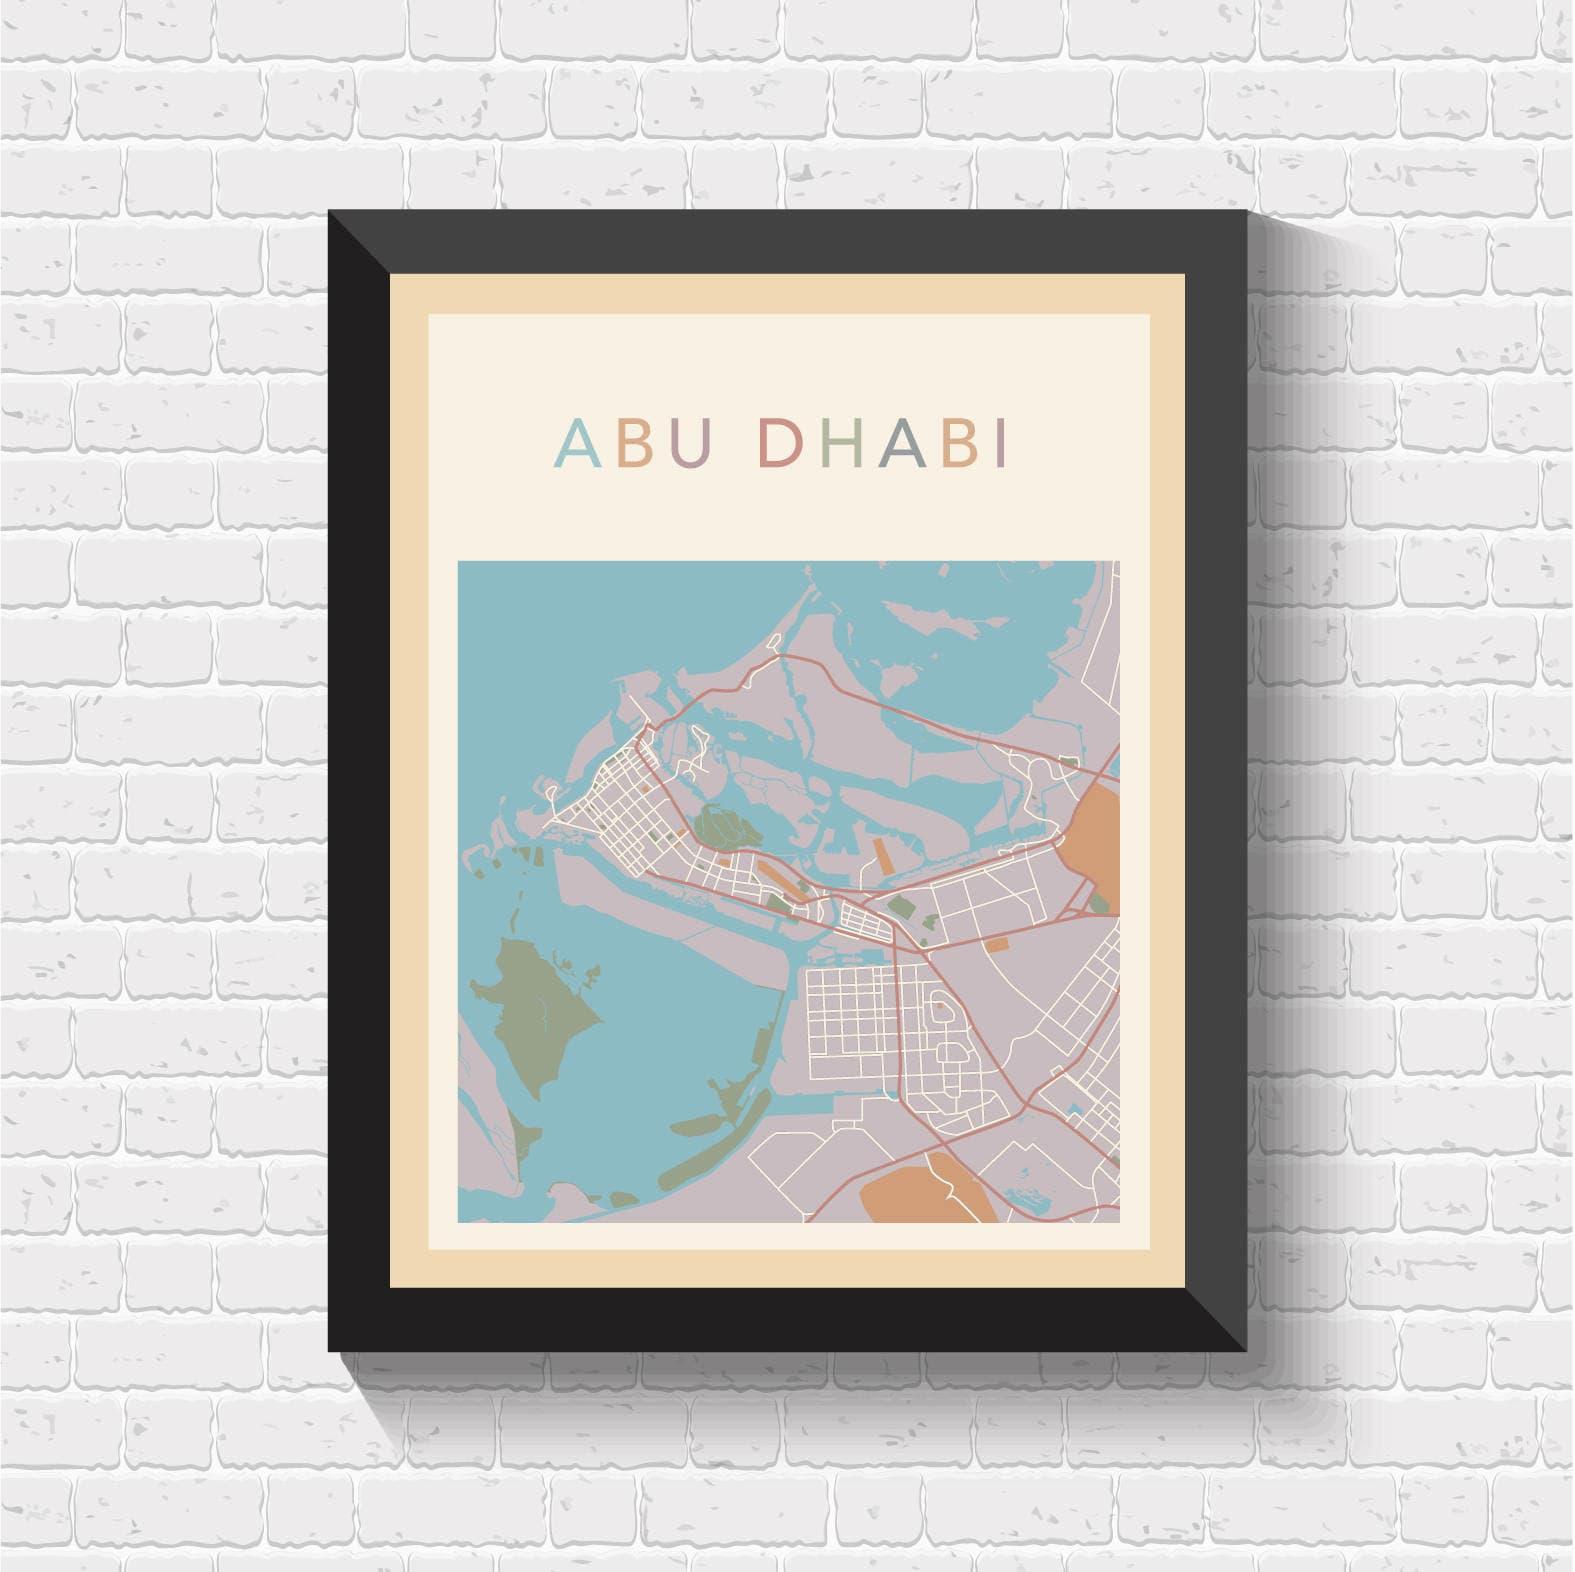 Abu Dhabi Map Abu Dhabi Poster Abu Dhabi Print Abu Dhabi